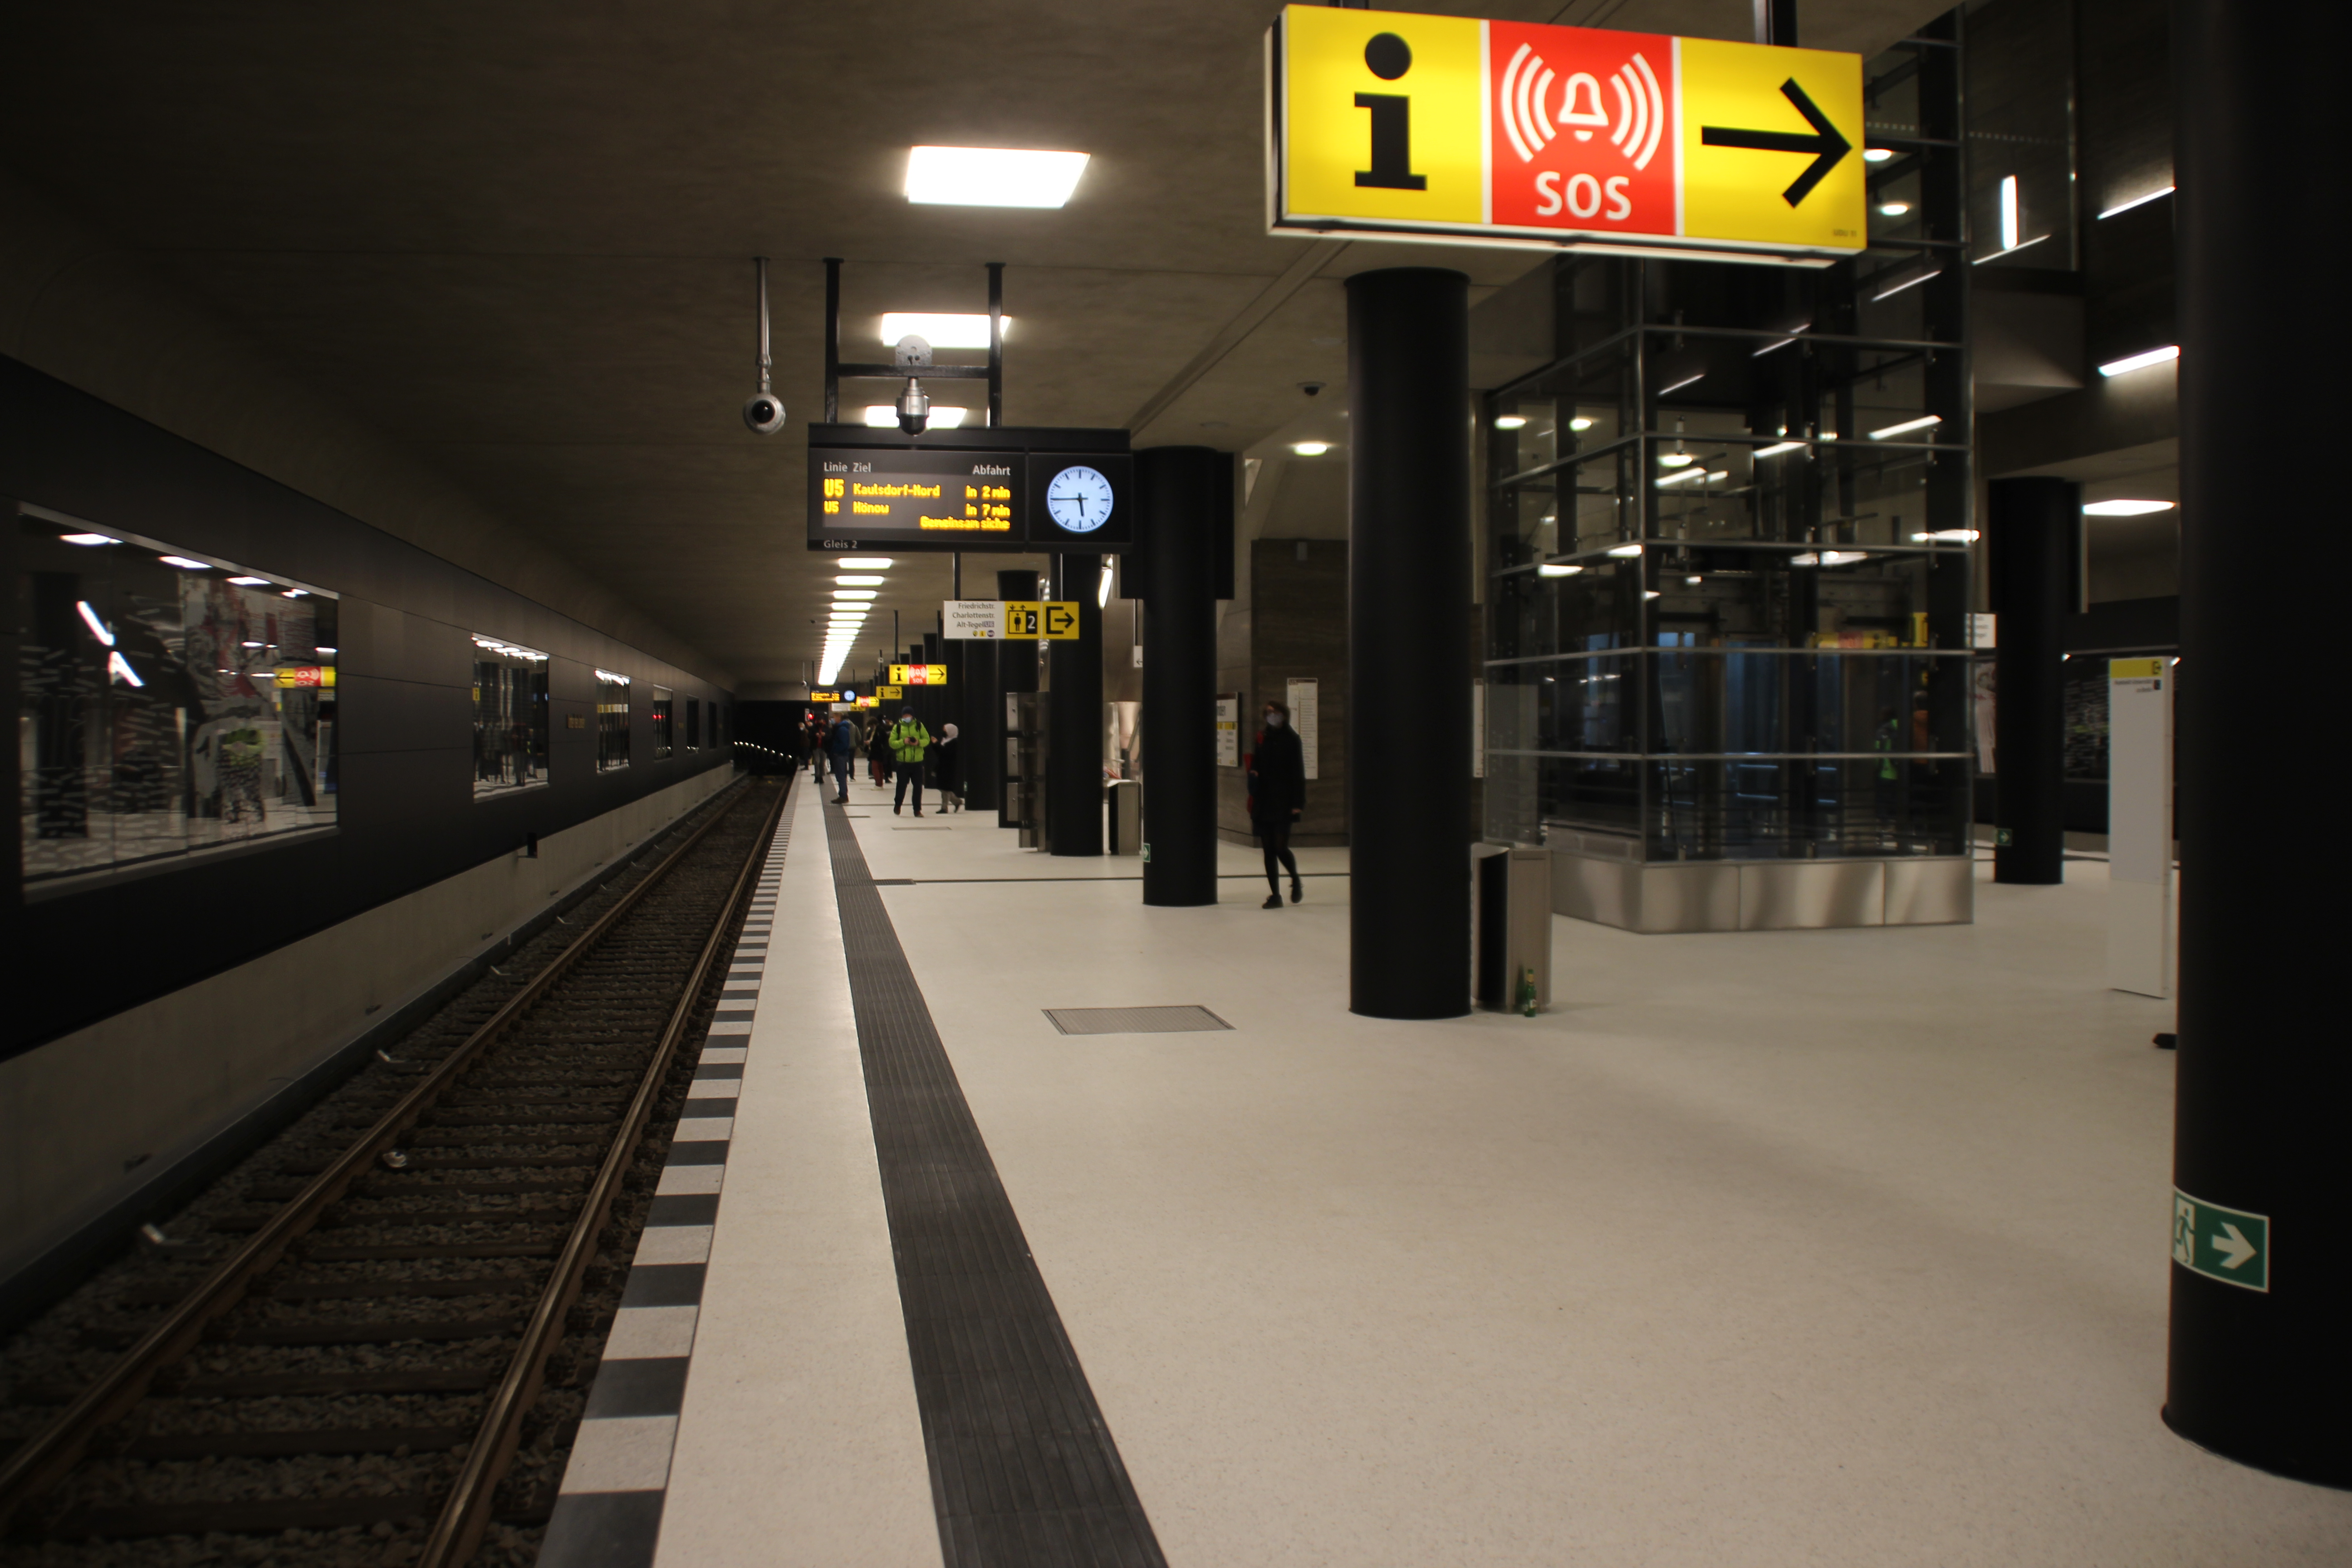 U-Bahnhof Unter den Linden U5 Bahnsteig.jpg